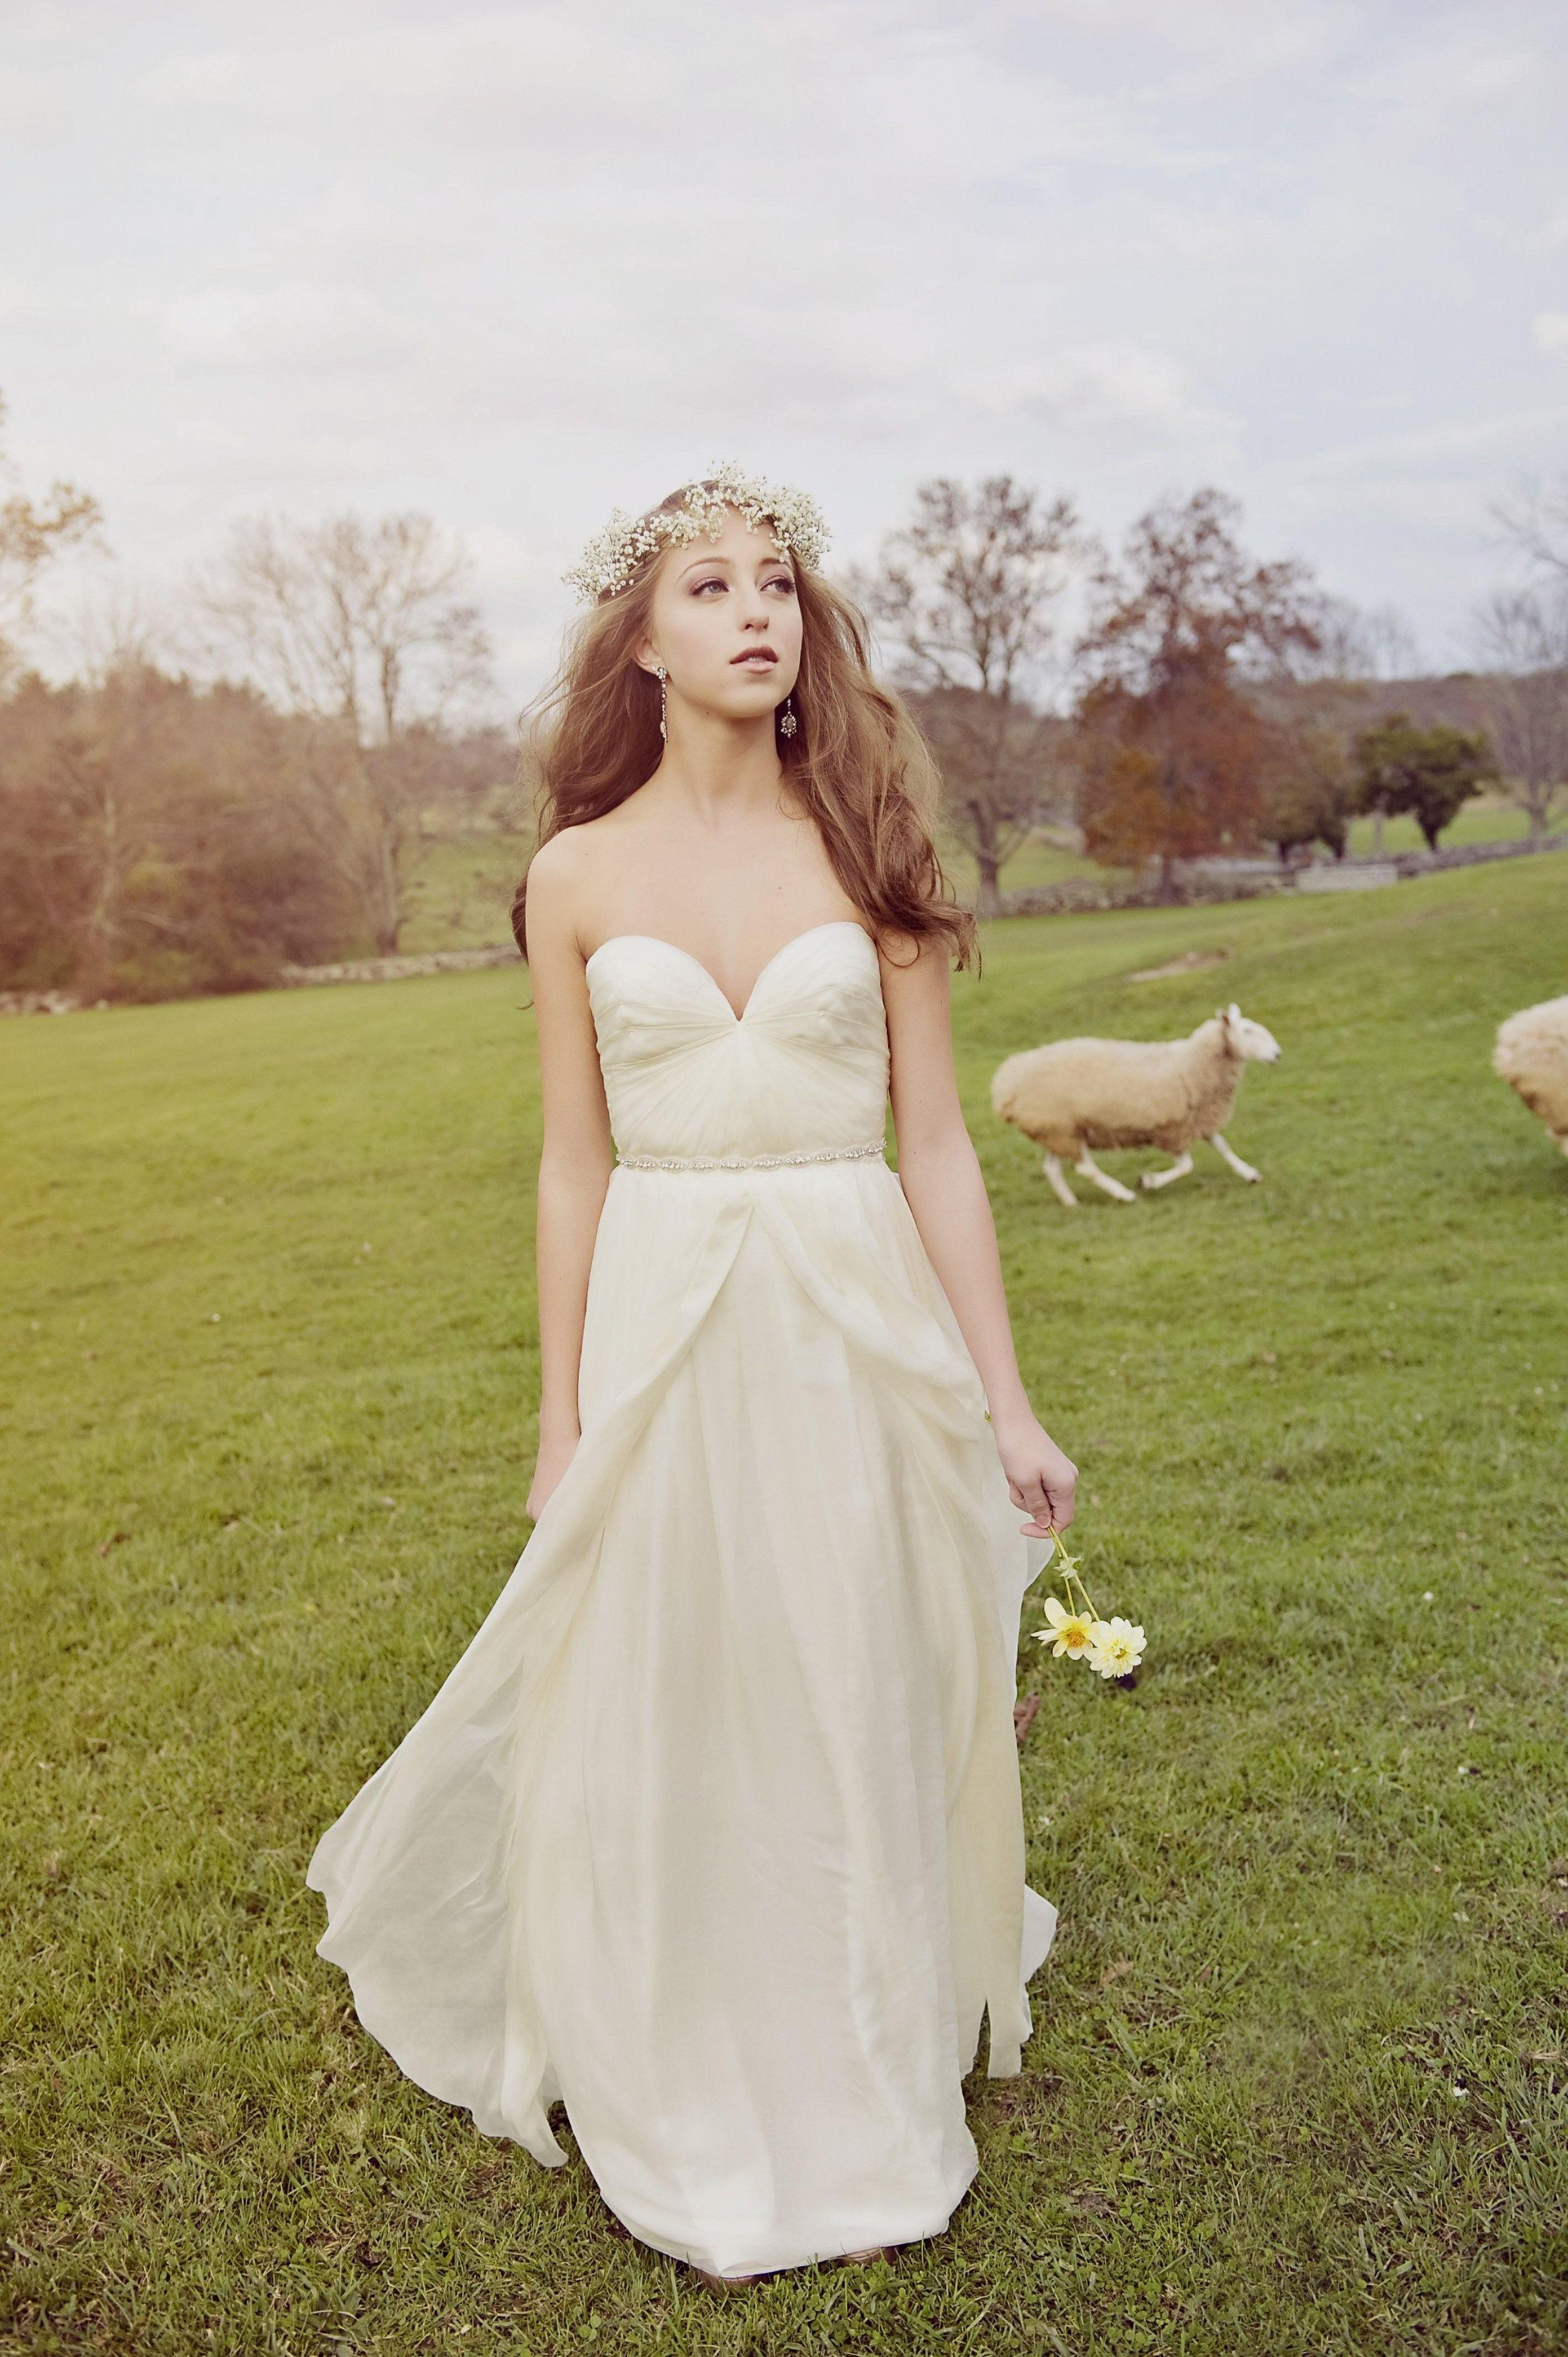 Casual Outdoor Fall Wedding Dresses High Cut Backyard Attire